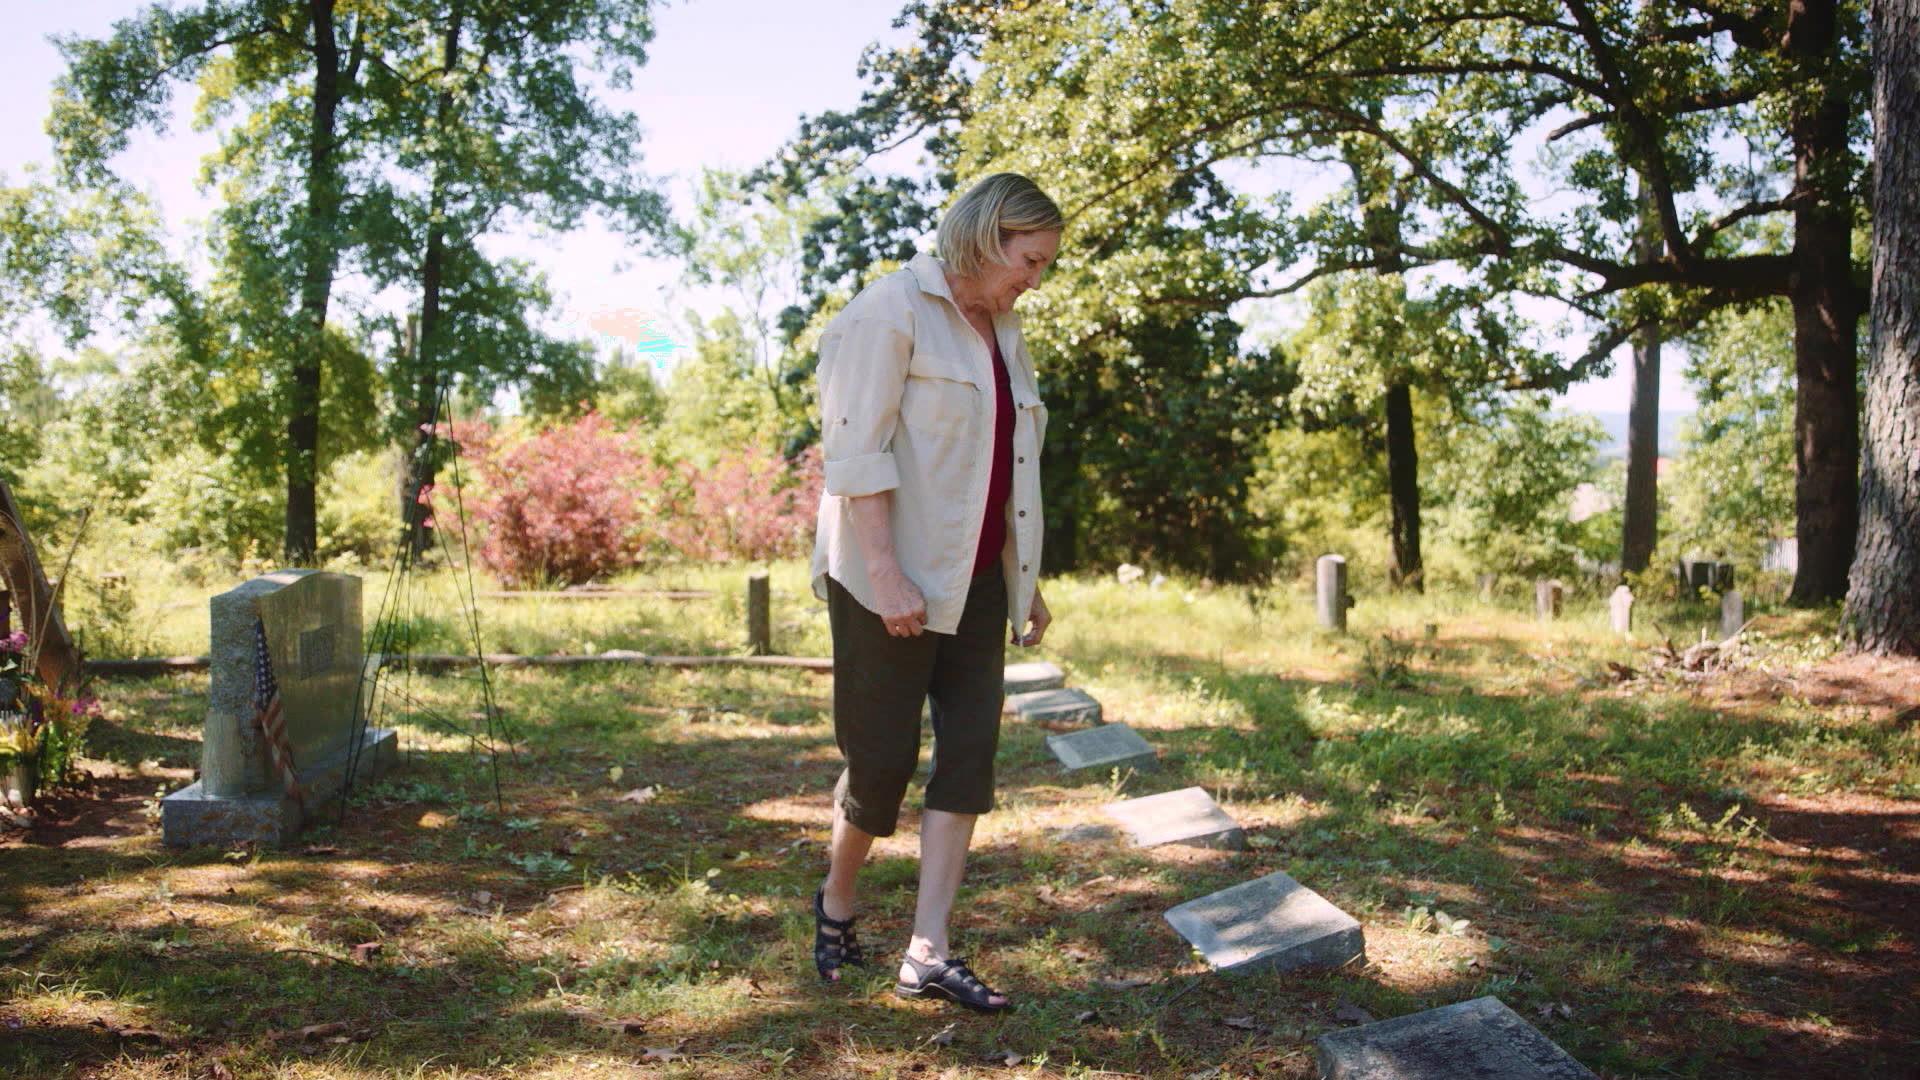 _The_Cemetery_Angel___Arkansas_woman_pro_8_20190620214124